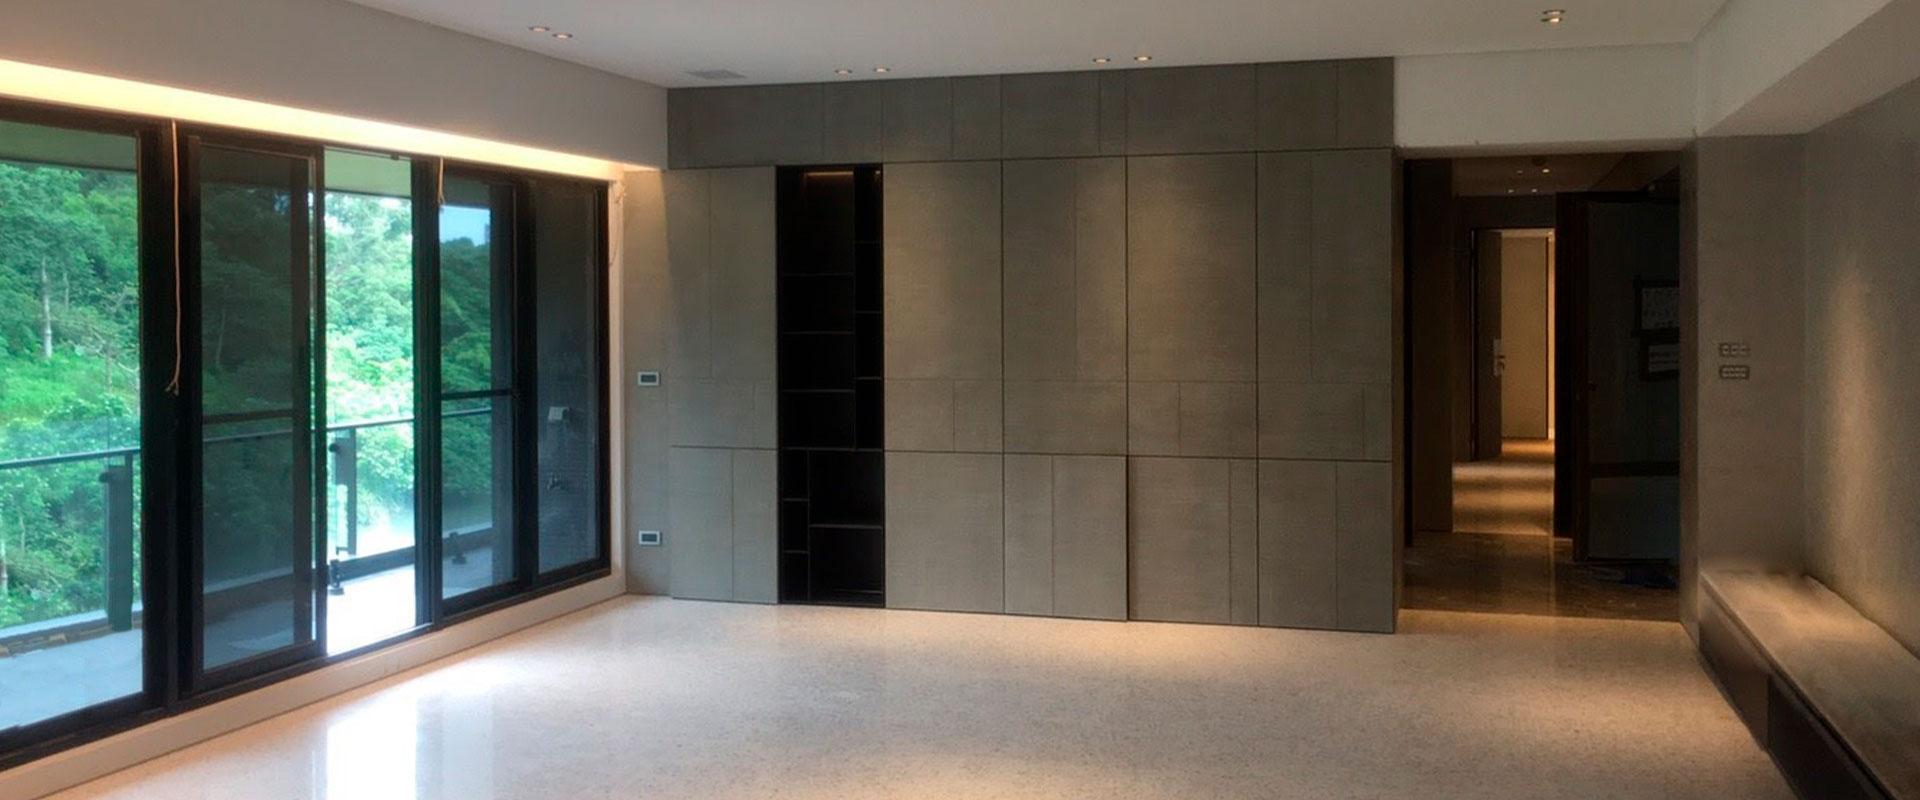 AGGLOTECH-progetto-luxury-apartment-slider-1